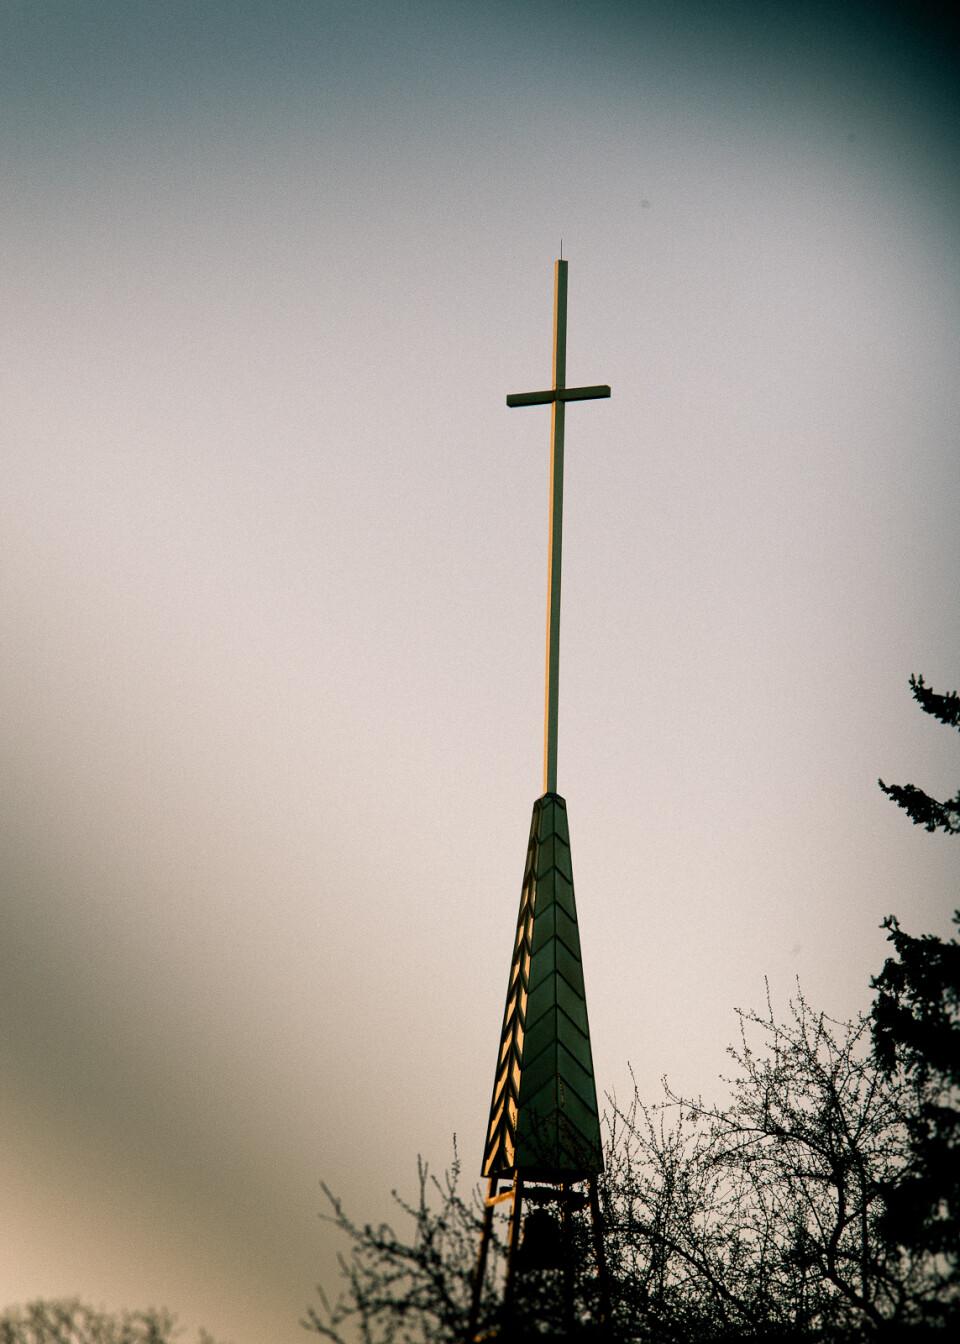 6:30 Livestream Wednesday Lent Service